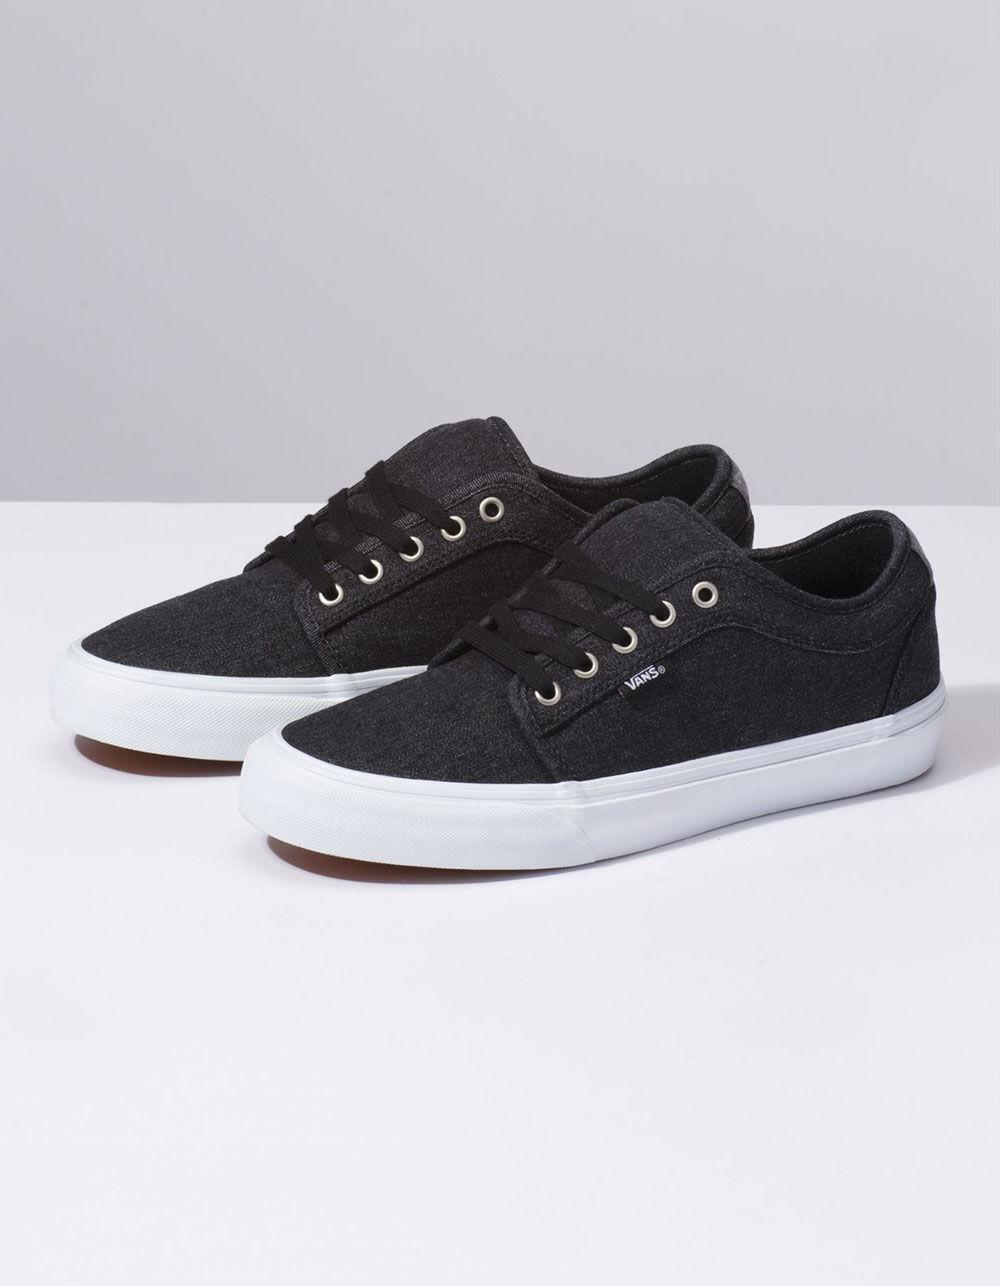 1aec8b6416b9c9 Lyst - Vans Denim Chukka Low Black   Pewter Shoes in Black for Men